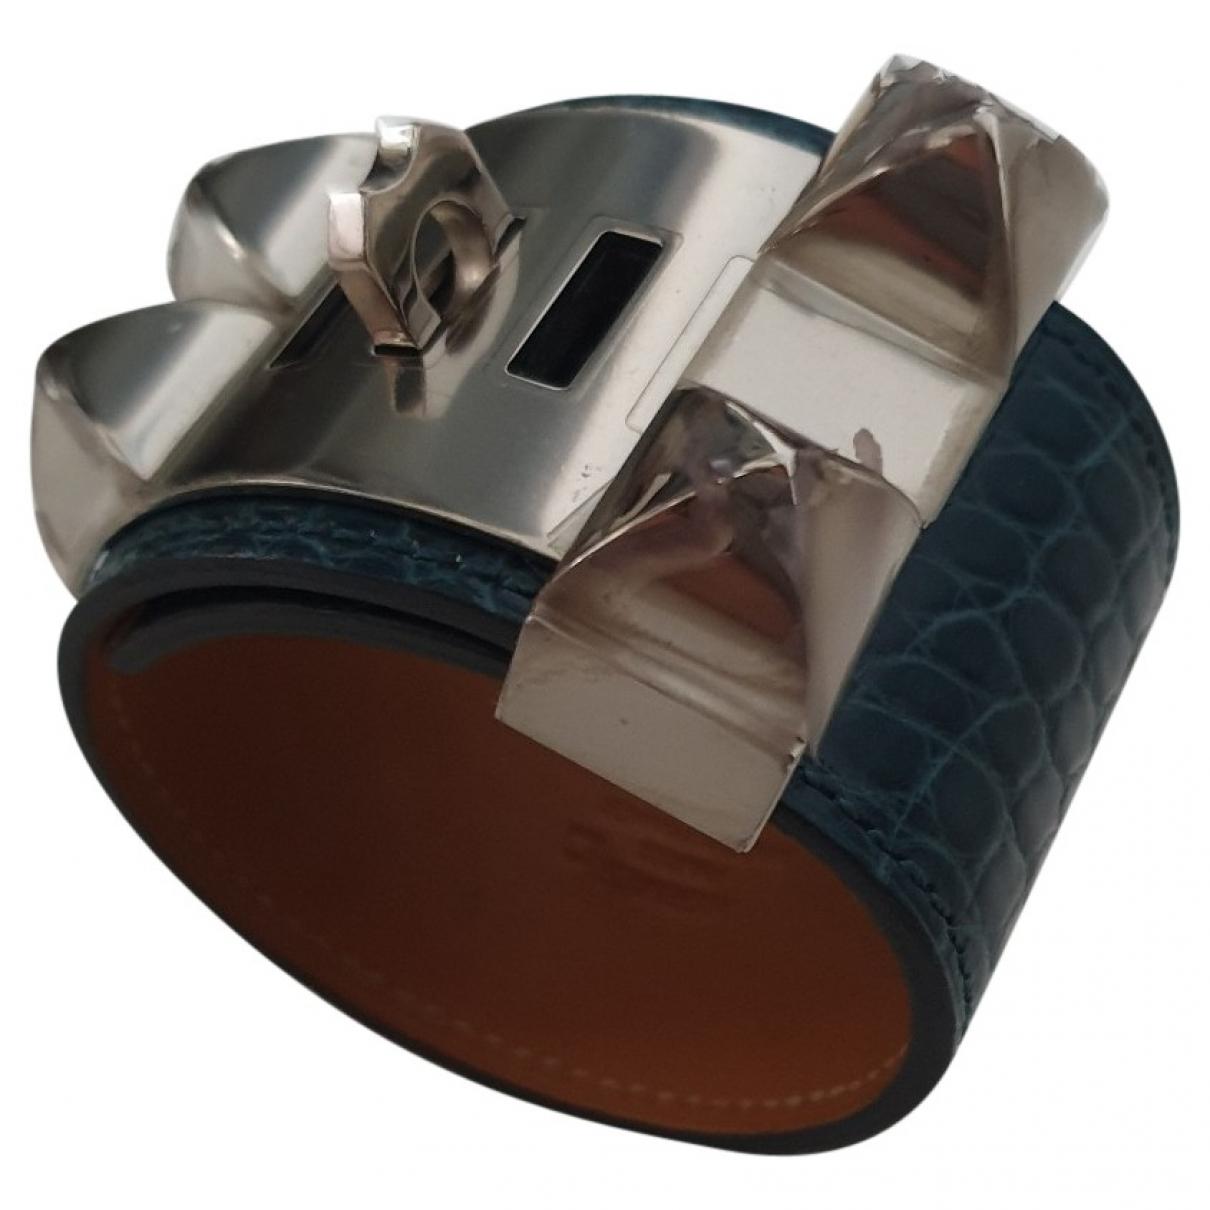 Hermes Collier de chien  Armband in  Blau Aligator